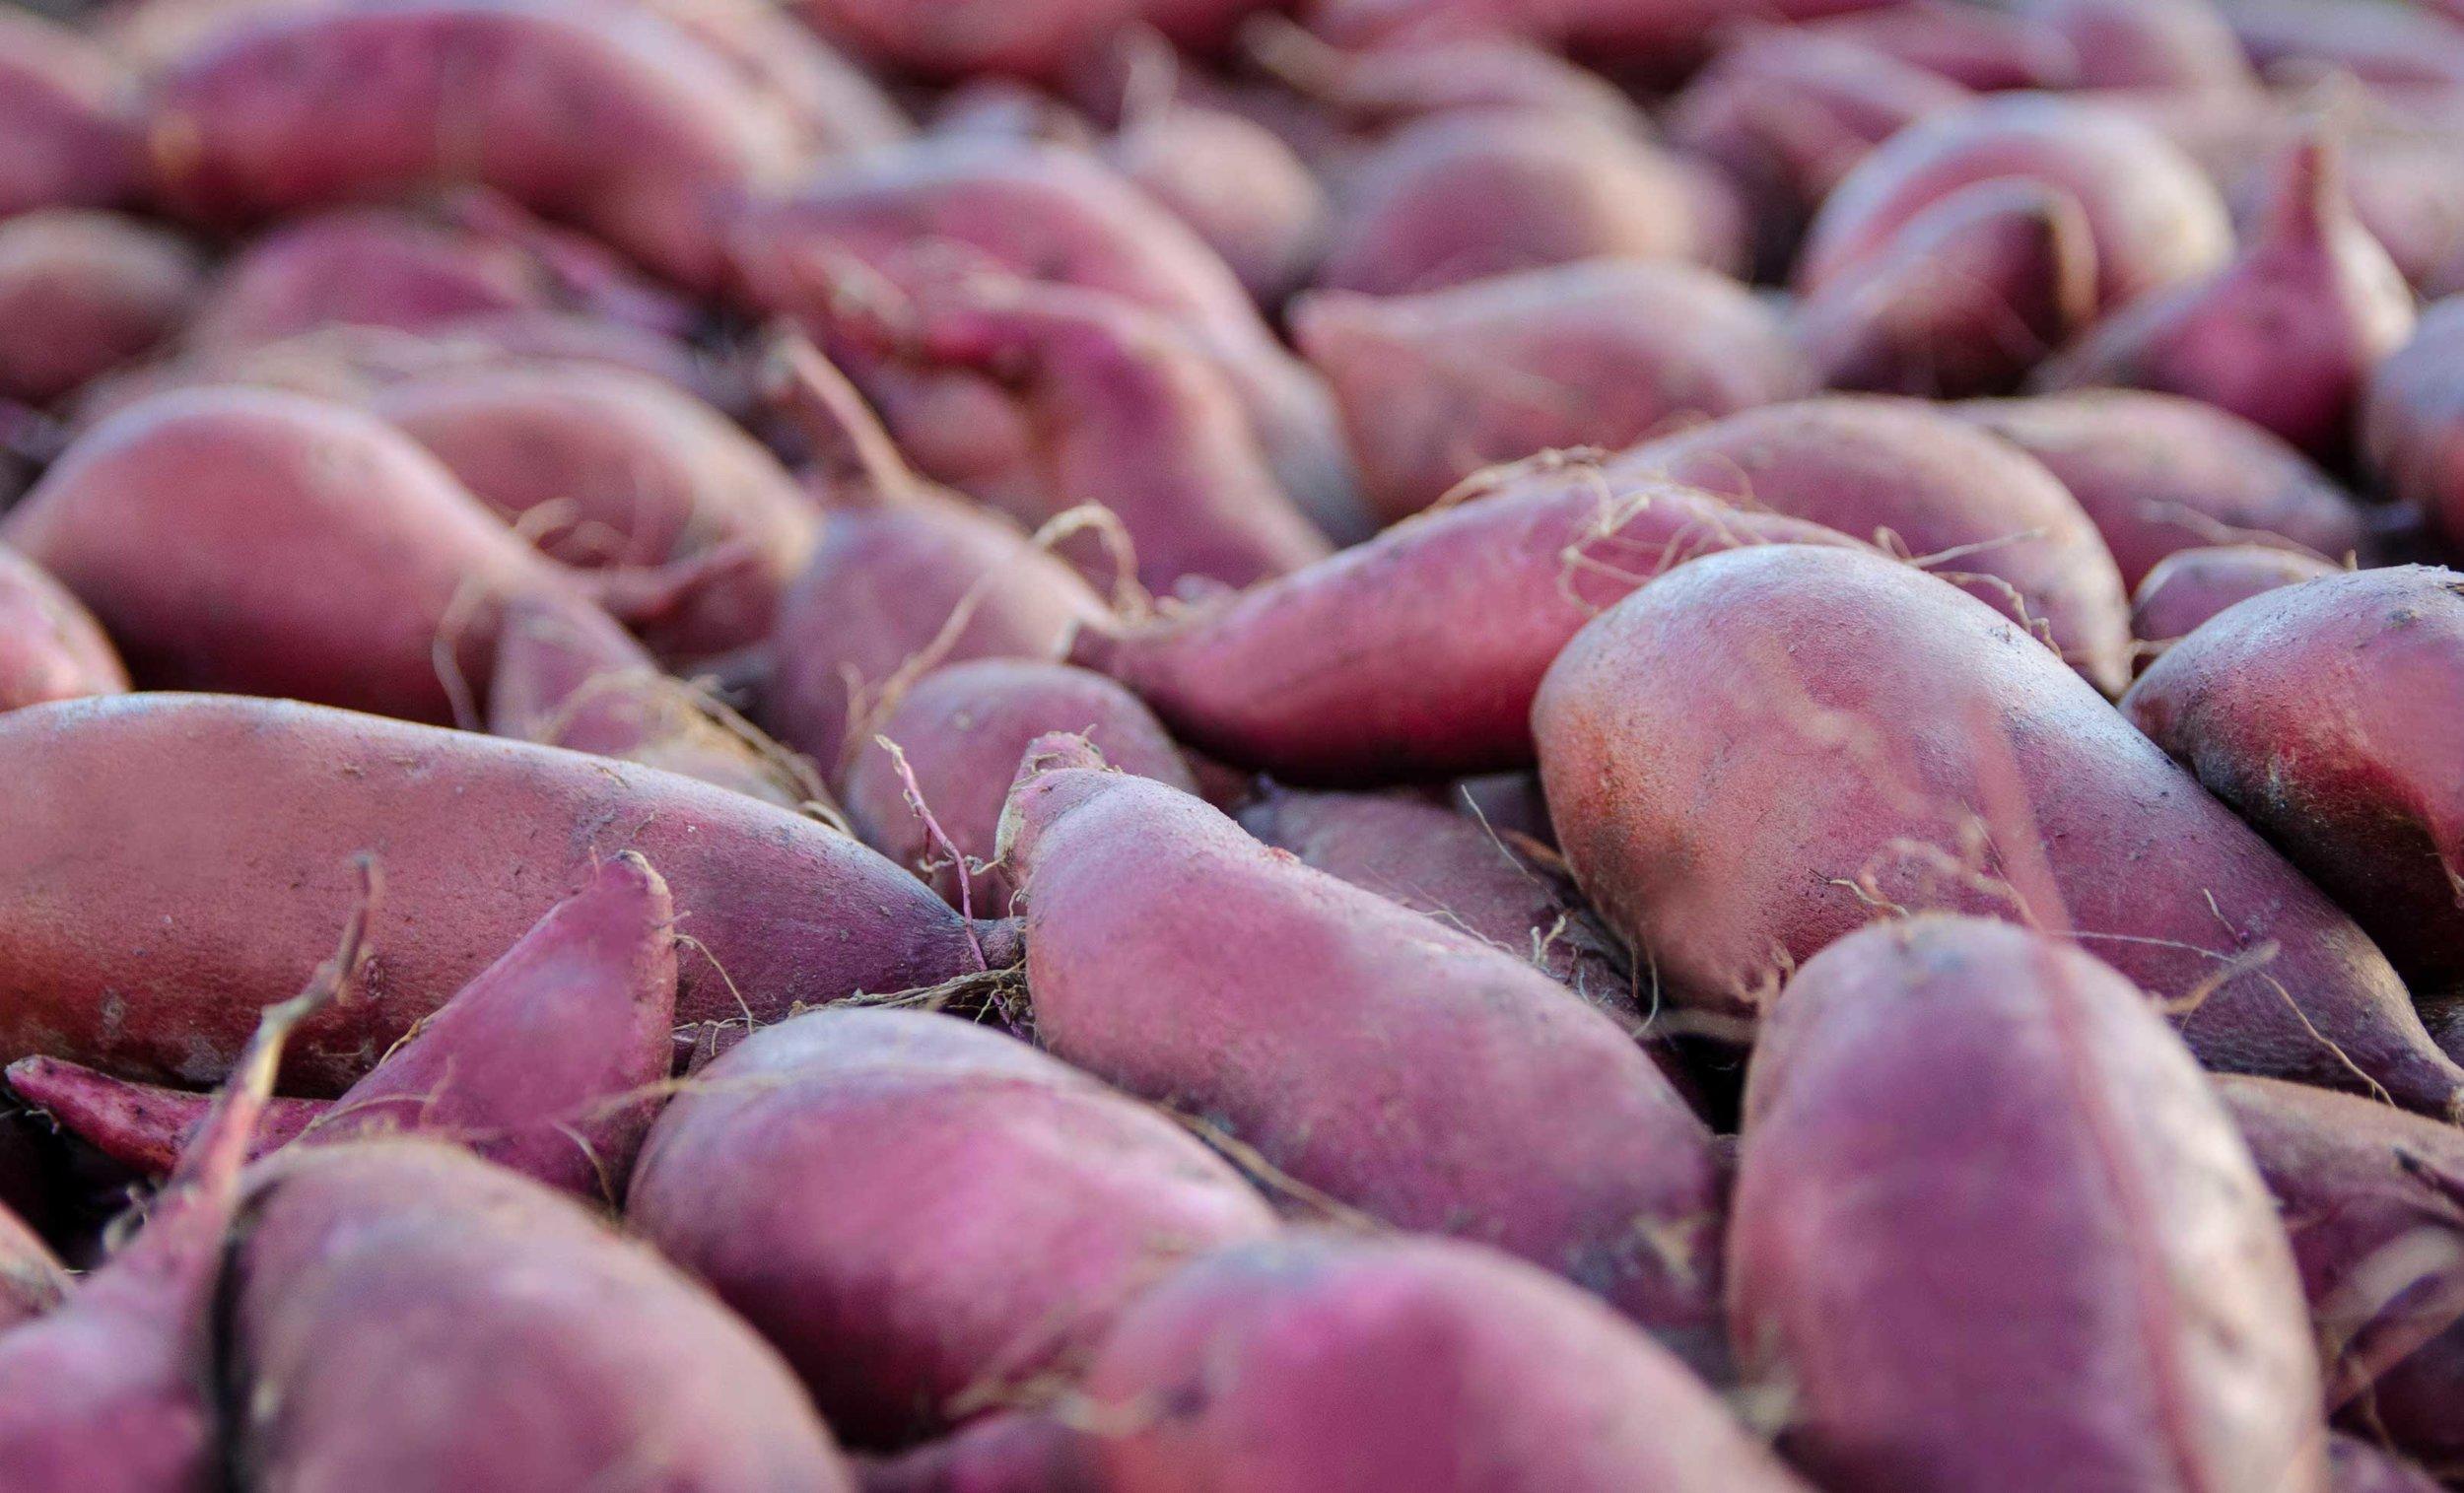 sweetpotatoesweb.jpg